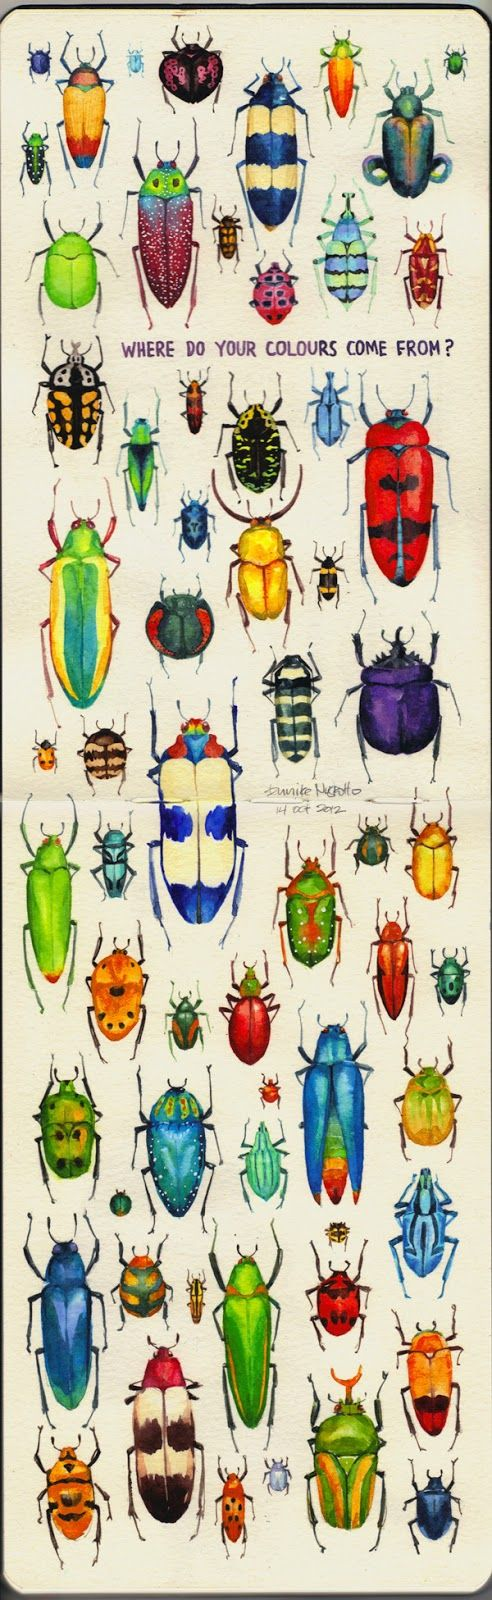 Eunike Nugroho's Sketchbook